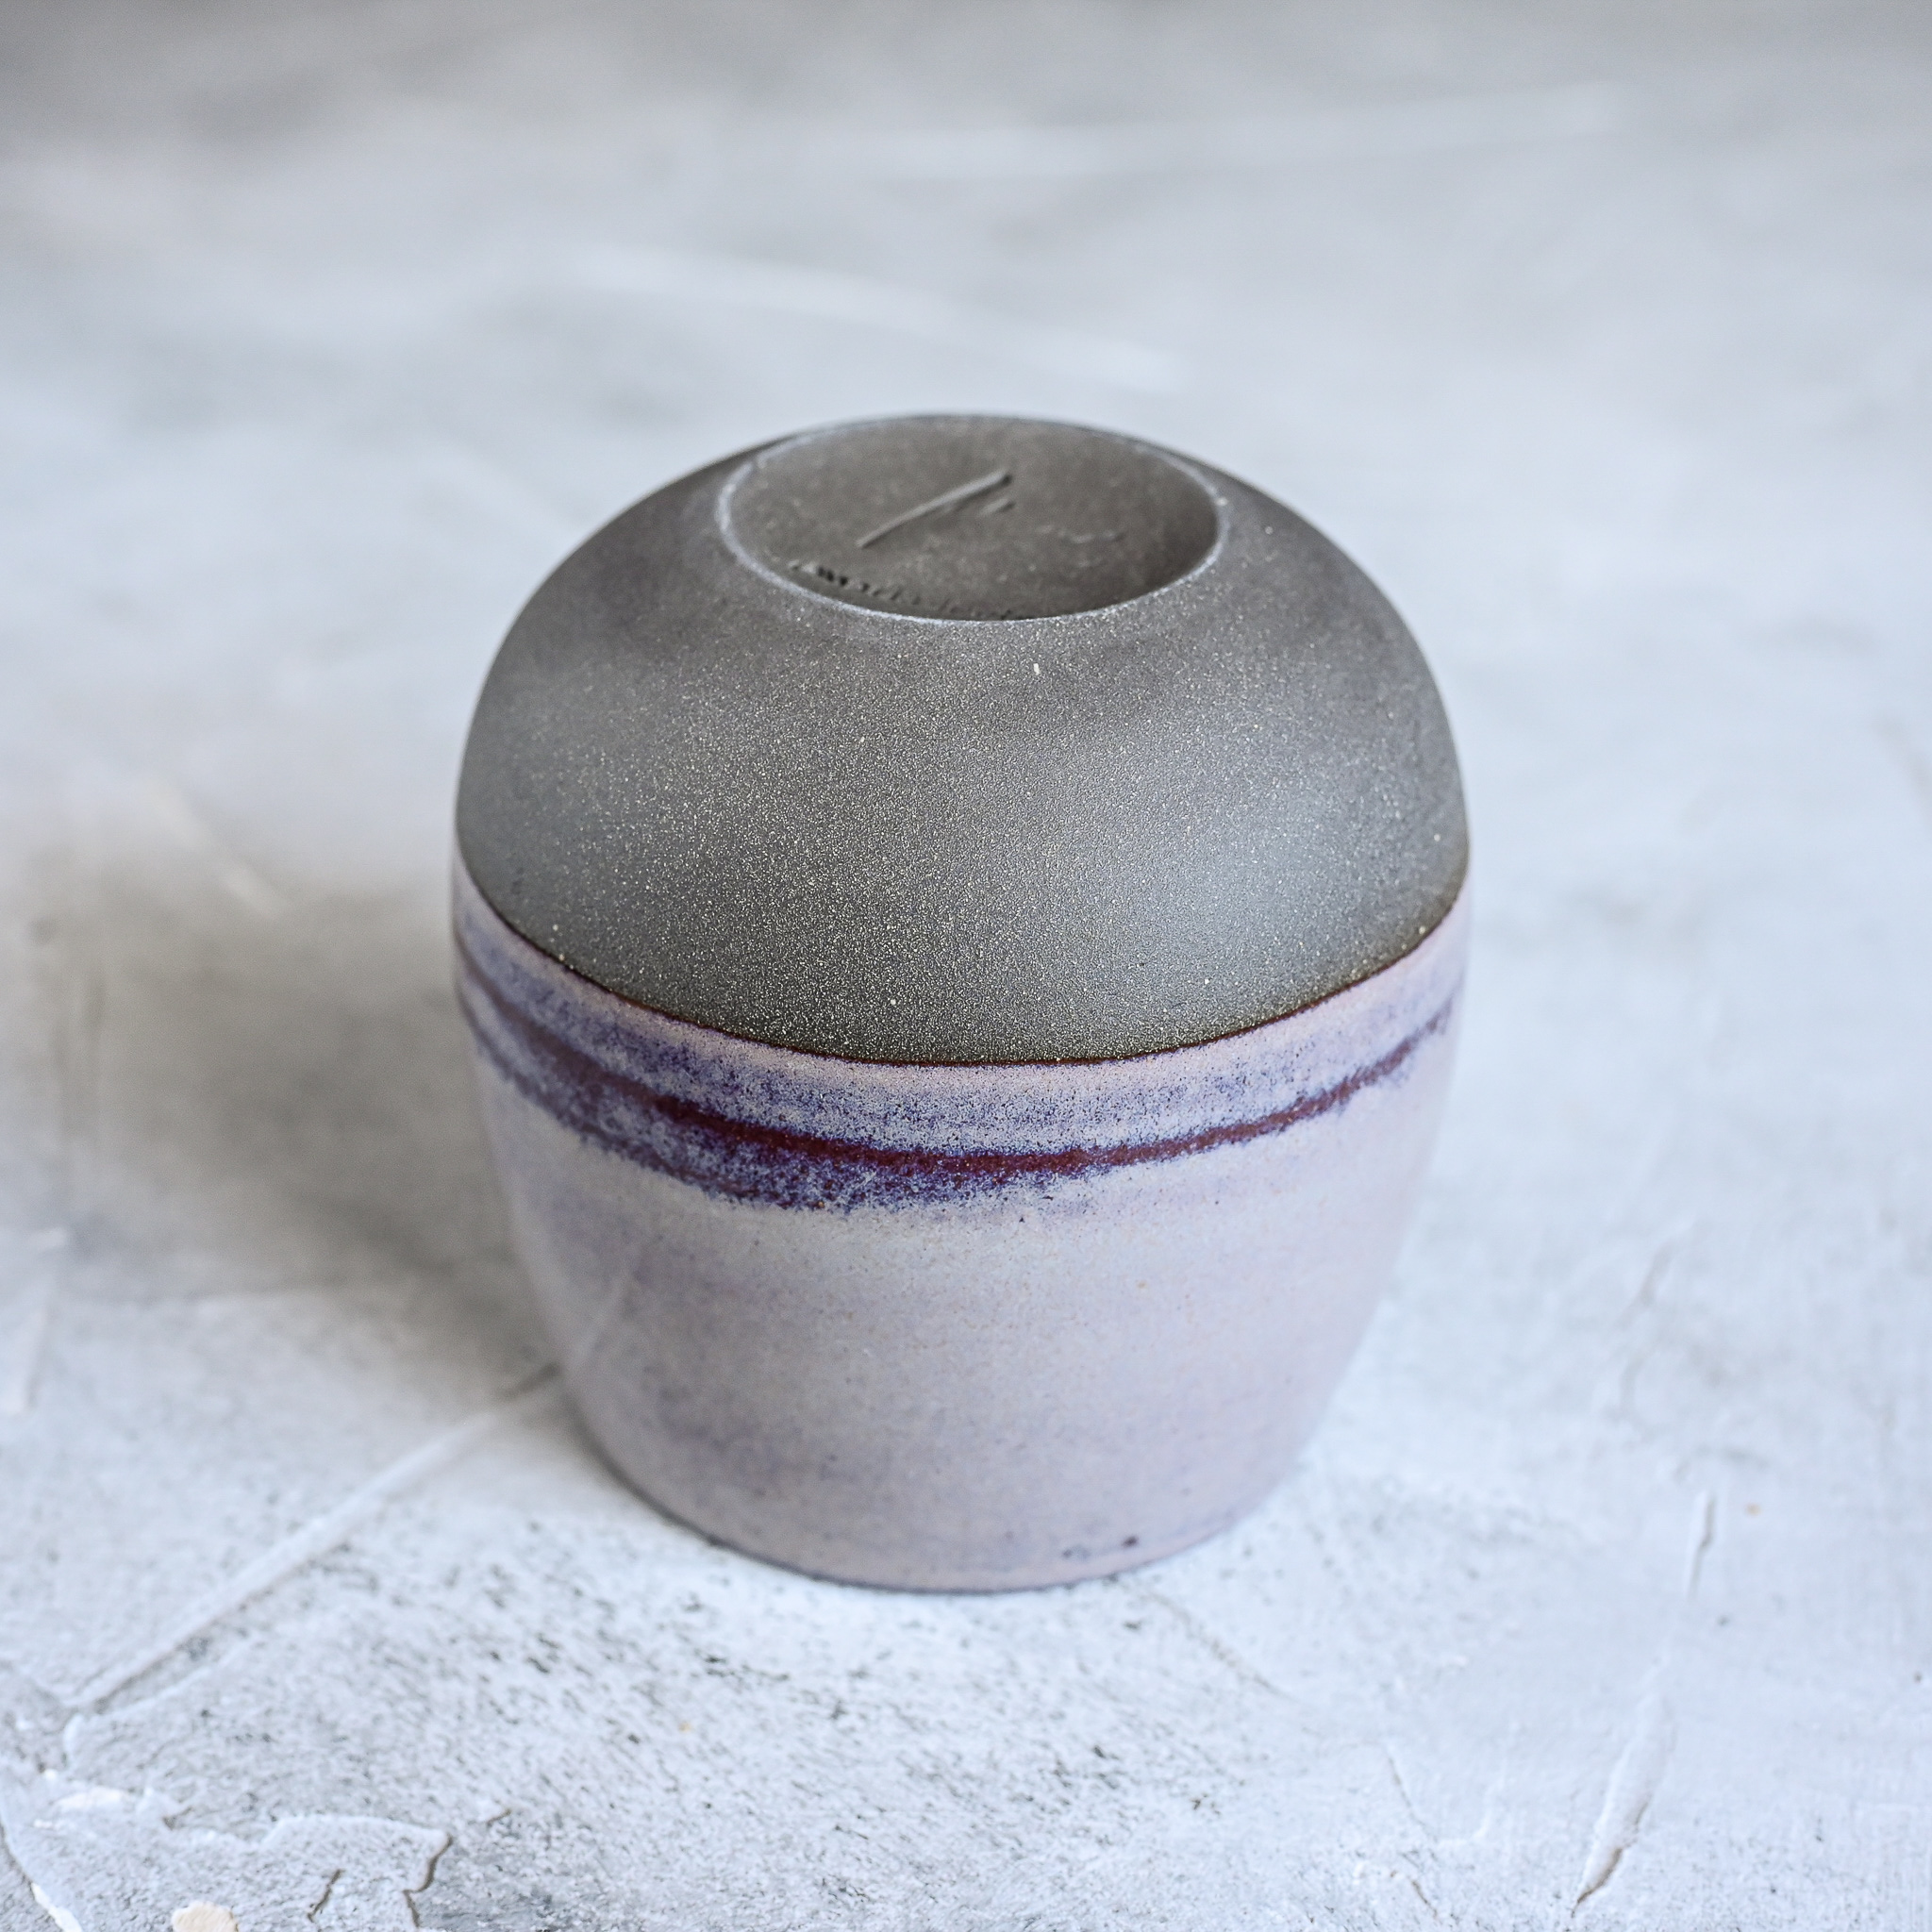 картинка Керамический стакан Марии Левиной 6 - DishWishes.Ru